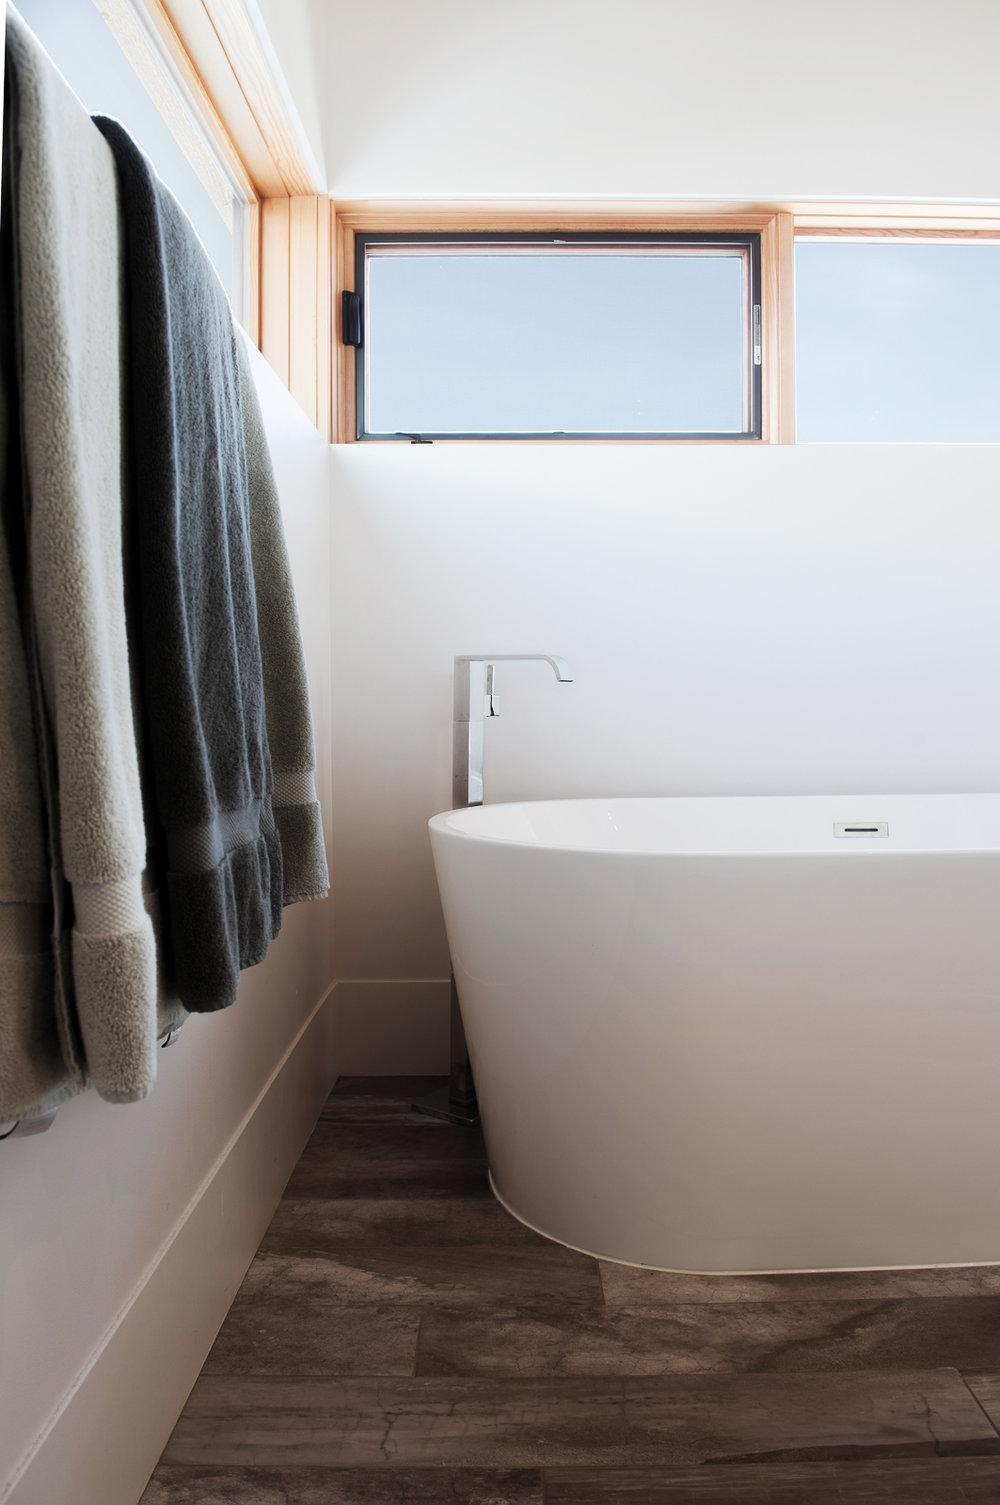 Woodworks-West-Bozeman-Montana-Builder-Cabinetry-Remodel-New-Construction-4463.jpg